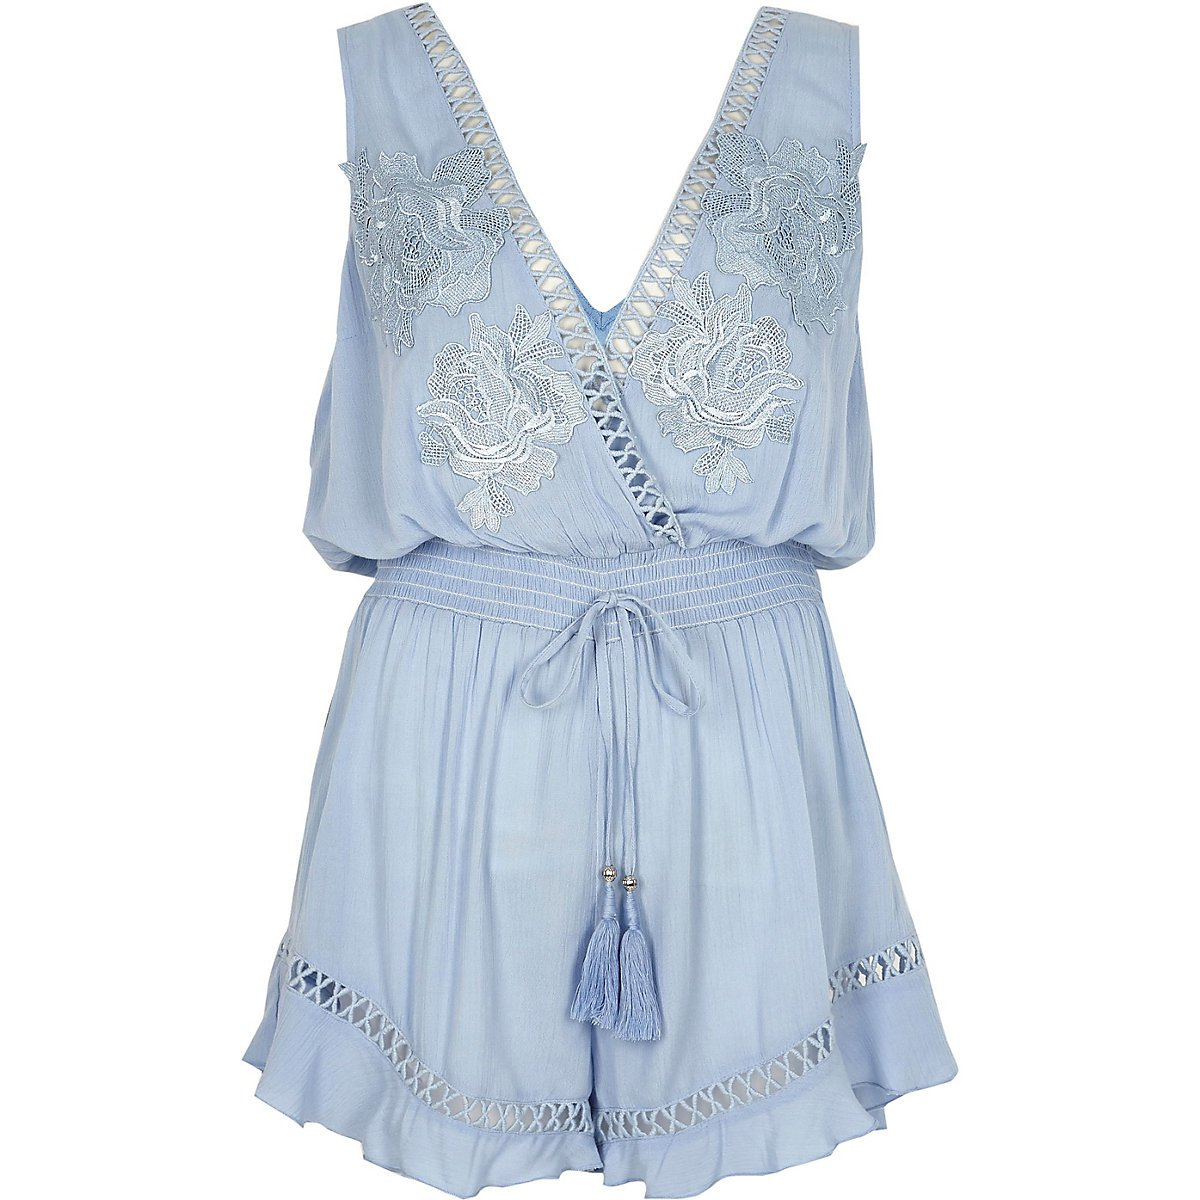 Blue applique beach romper - Caftans & Beach Cover-Ups - Swimwear & Beachwear - women